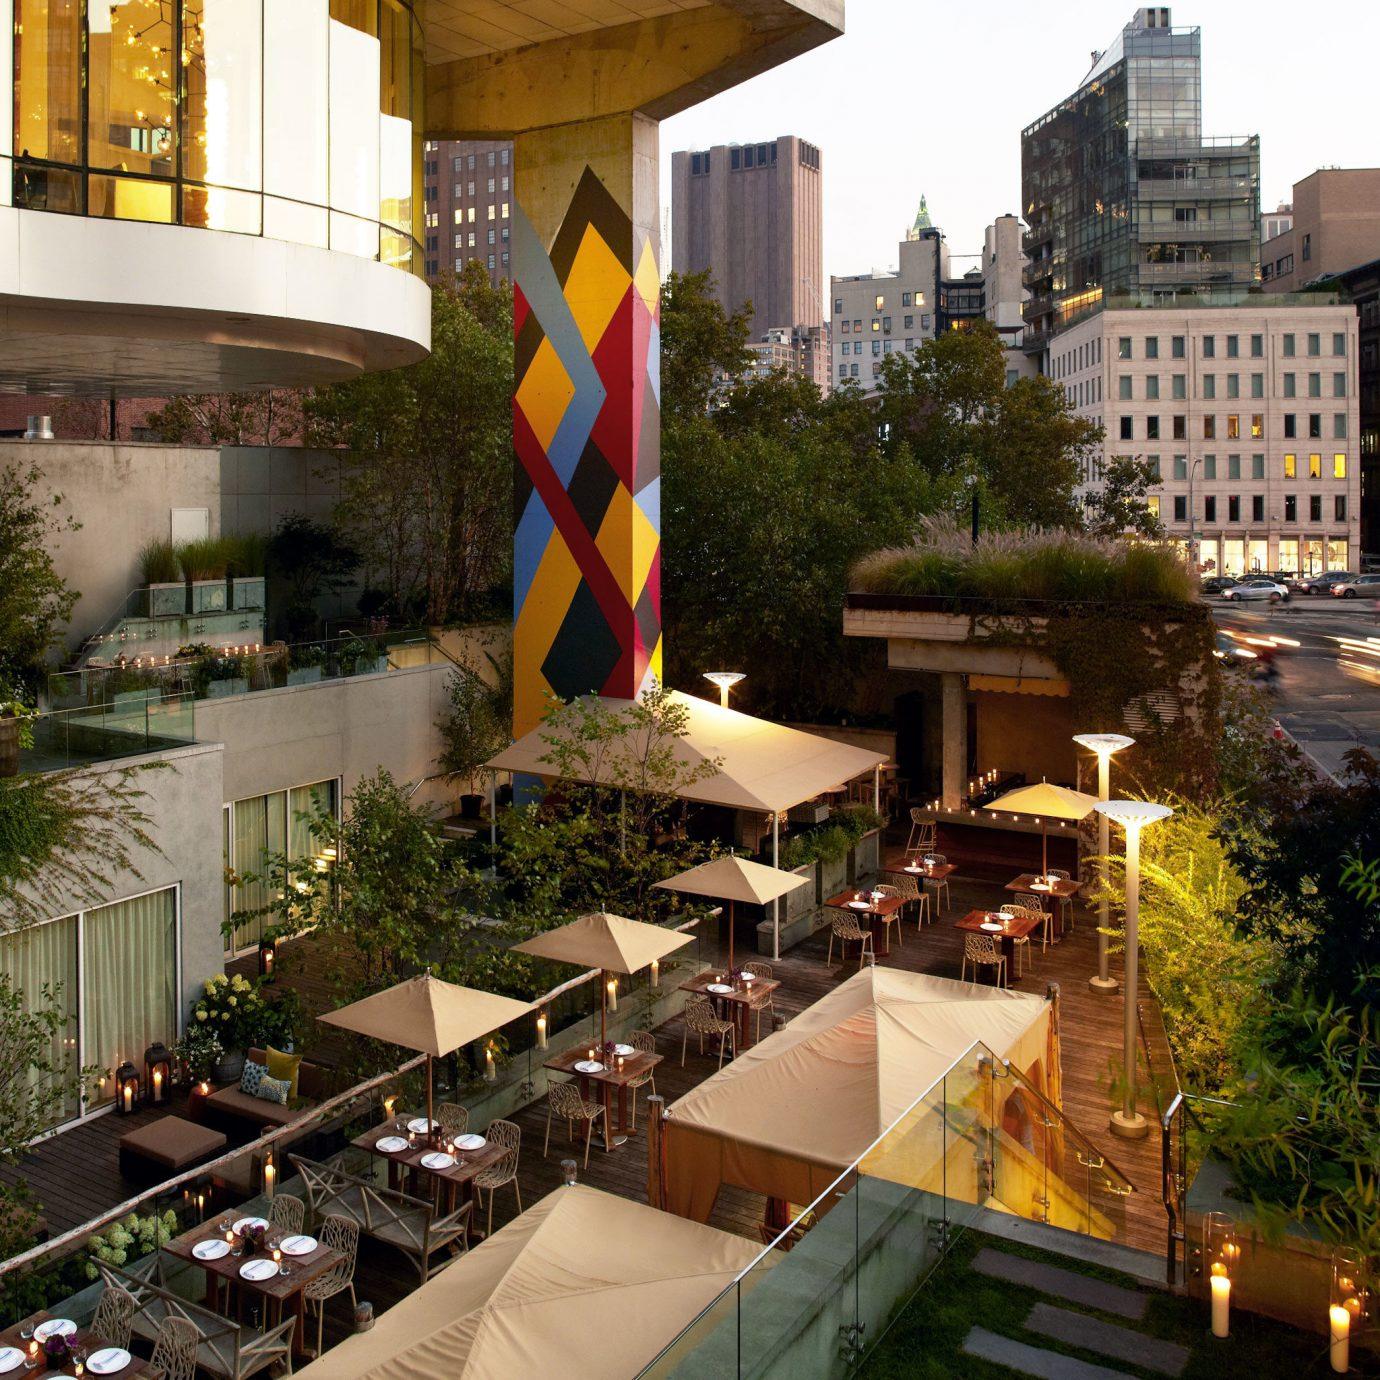 Boutique City Dining Drink Eat Hotels Modern Trip Ideas building Town neighbourhood plaza Downtown shopping mall